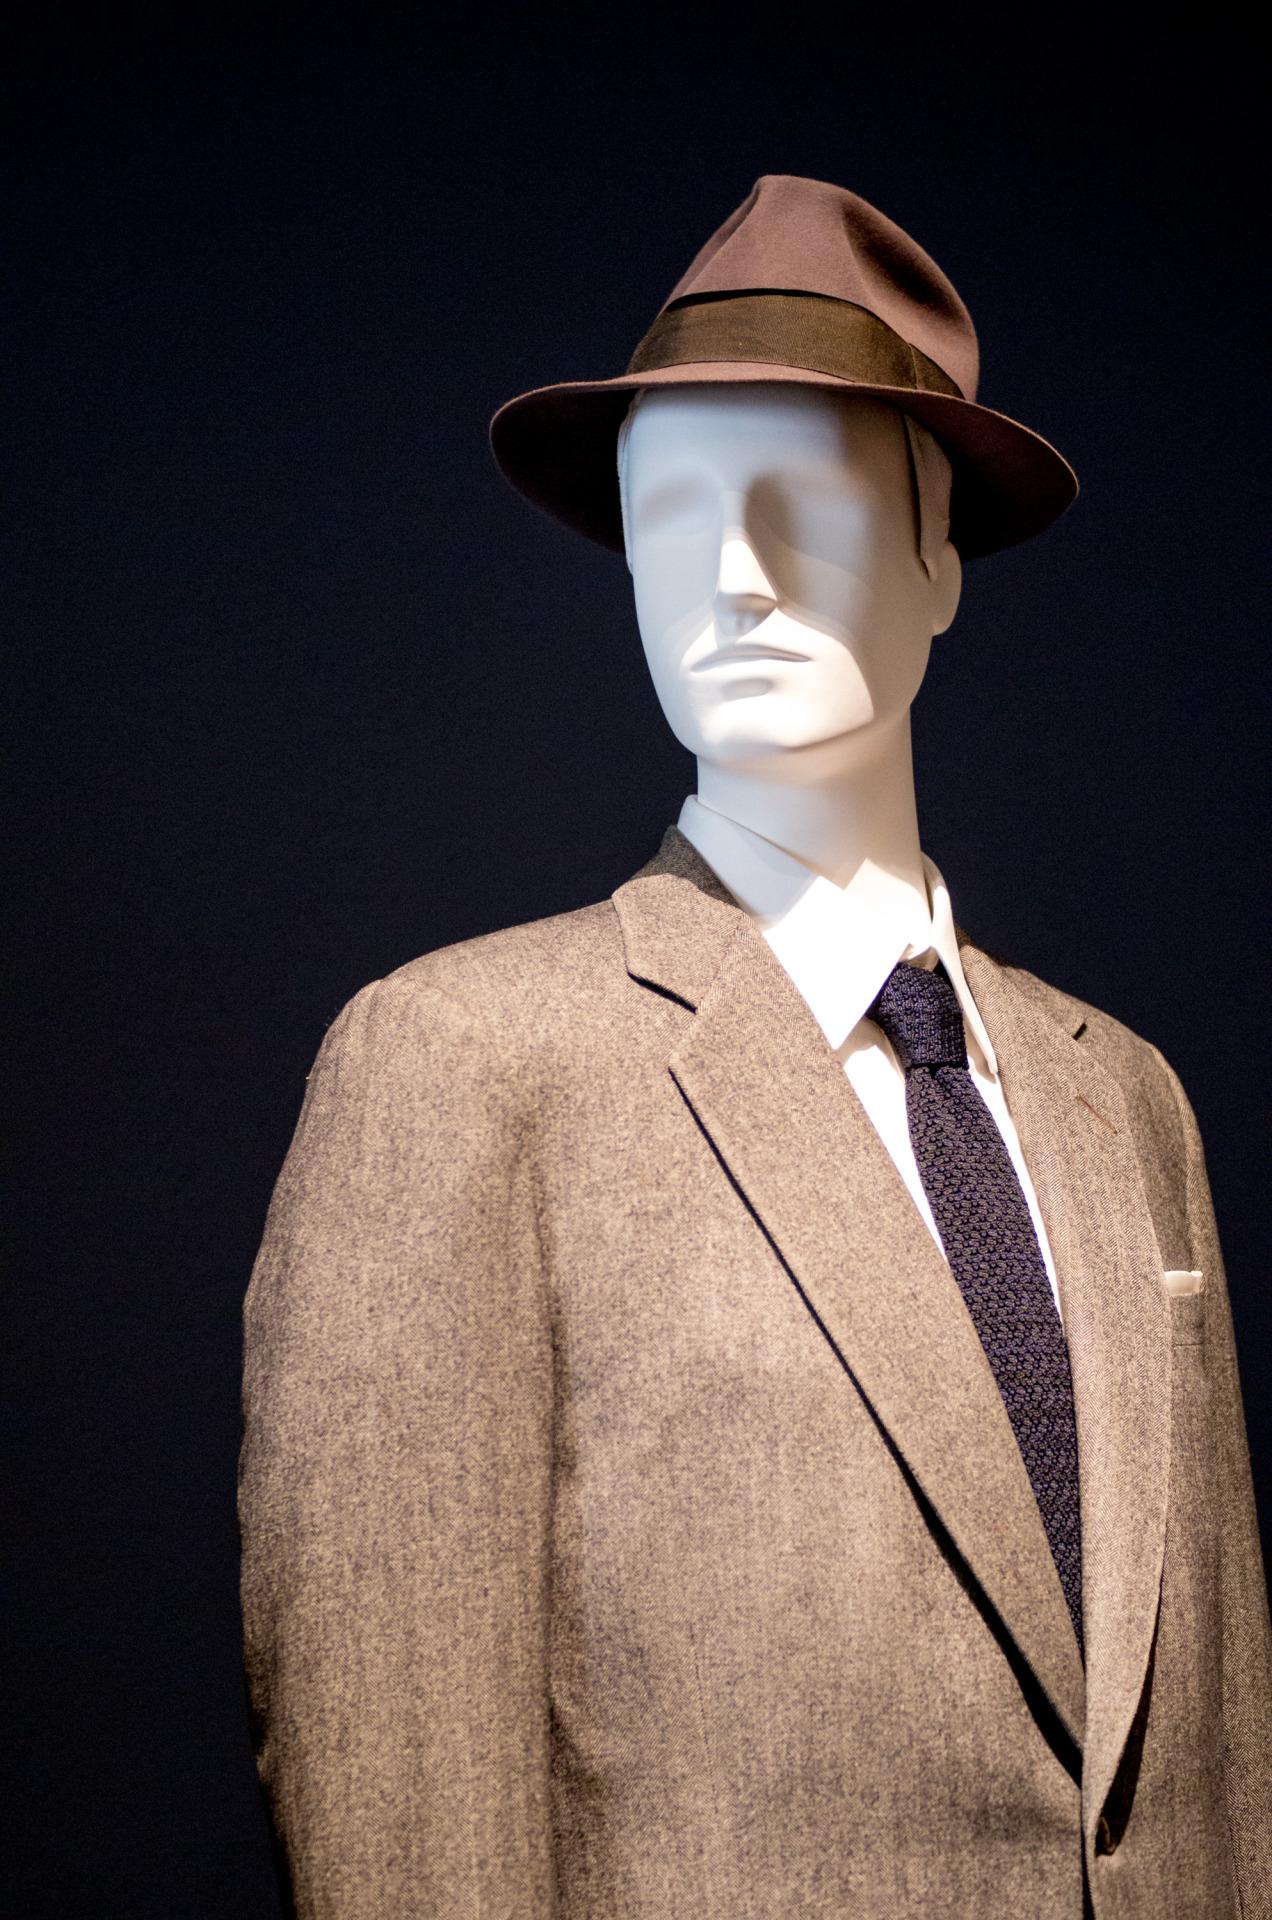 Reigning Men: Men's Style at LACMA